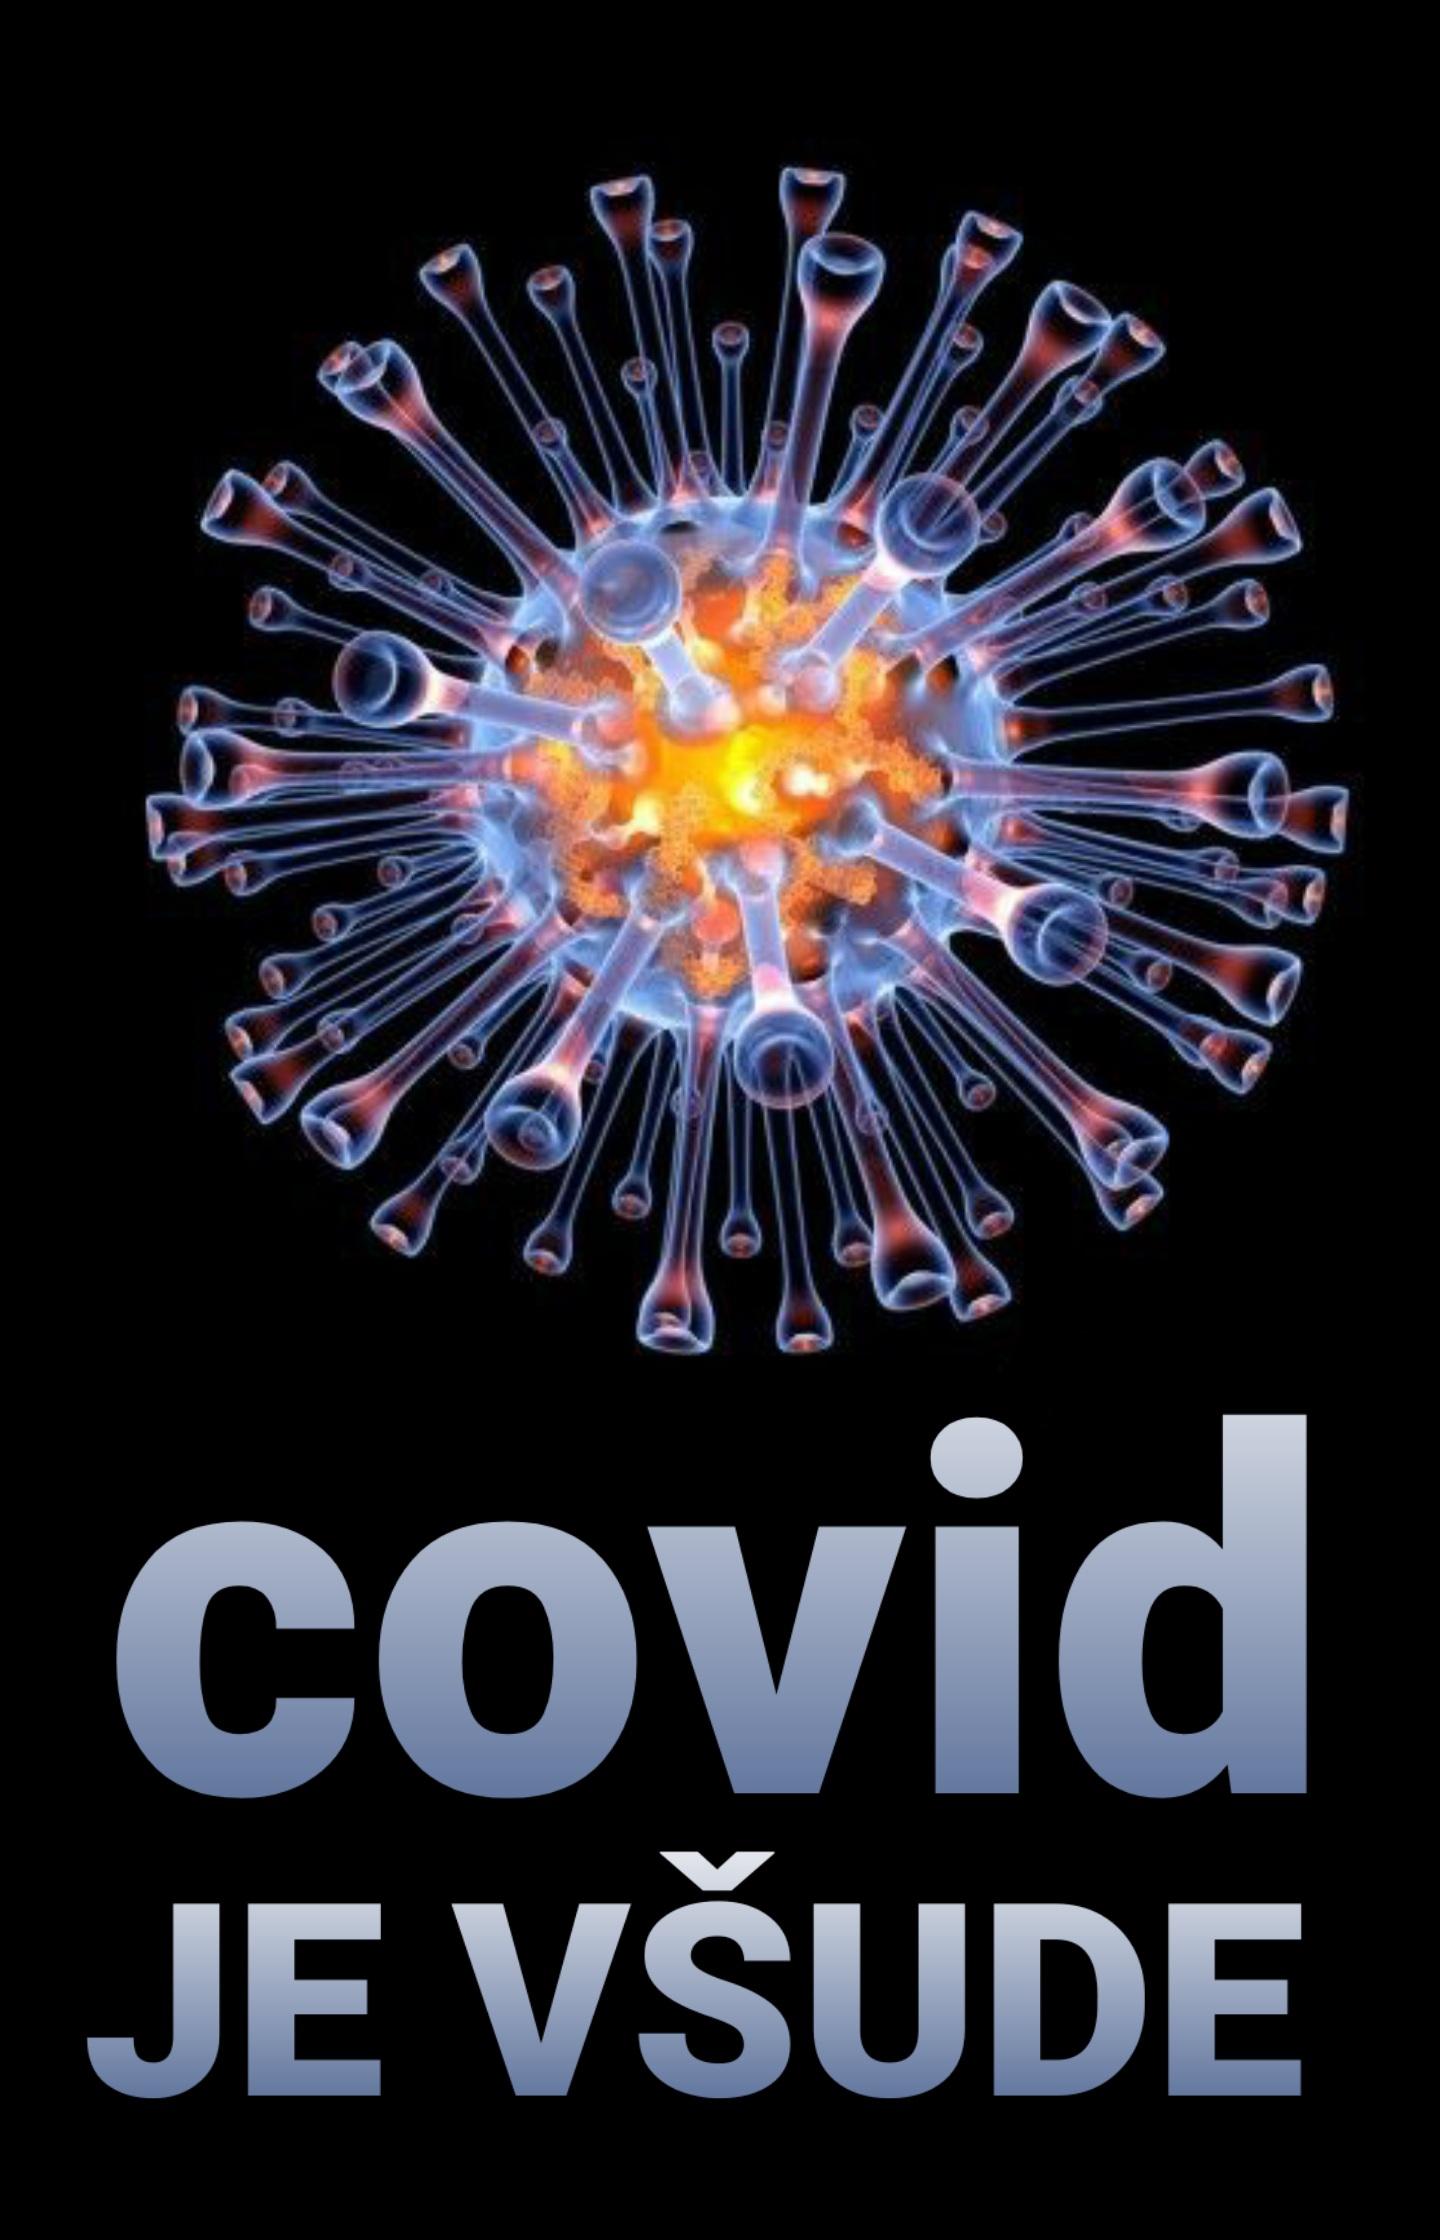 Covid-19 je všude